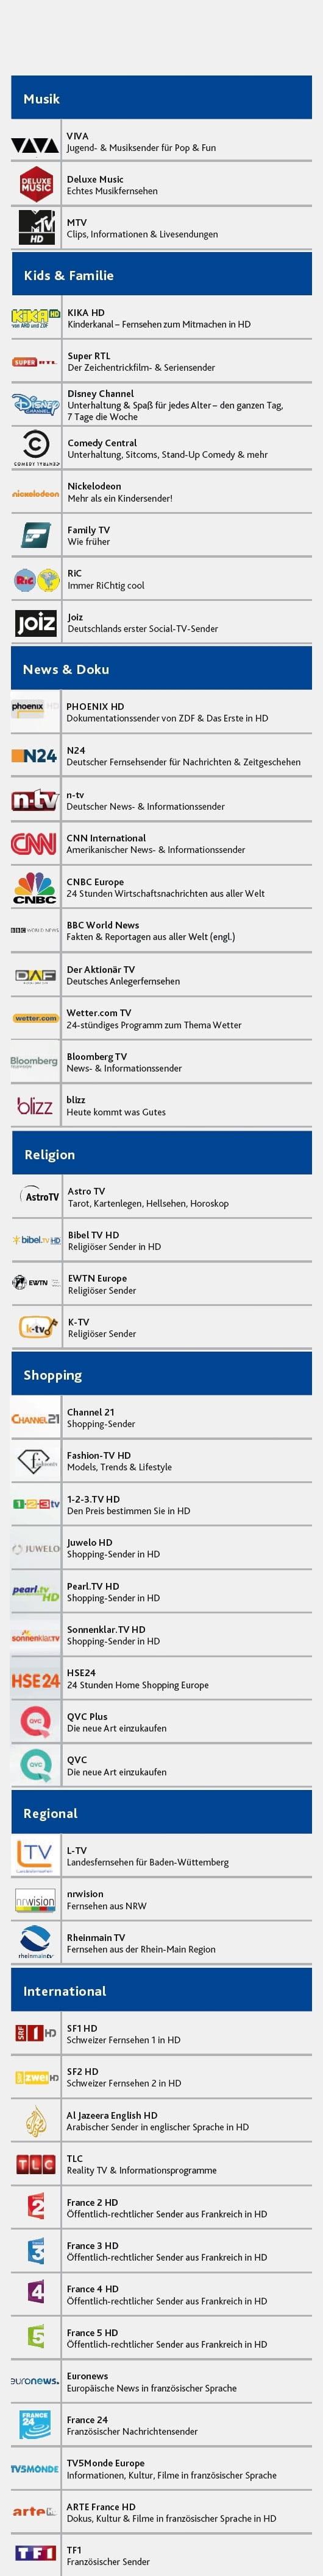 EWE TV Senderliste